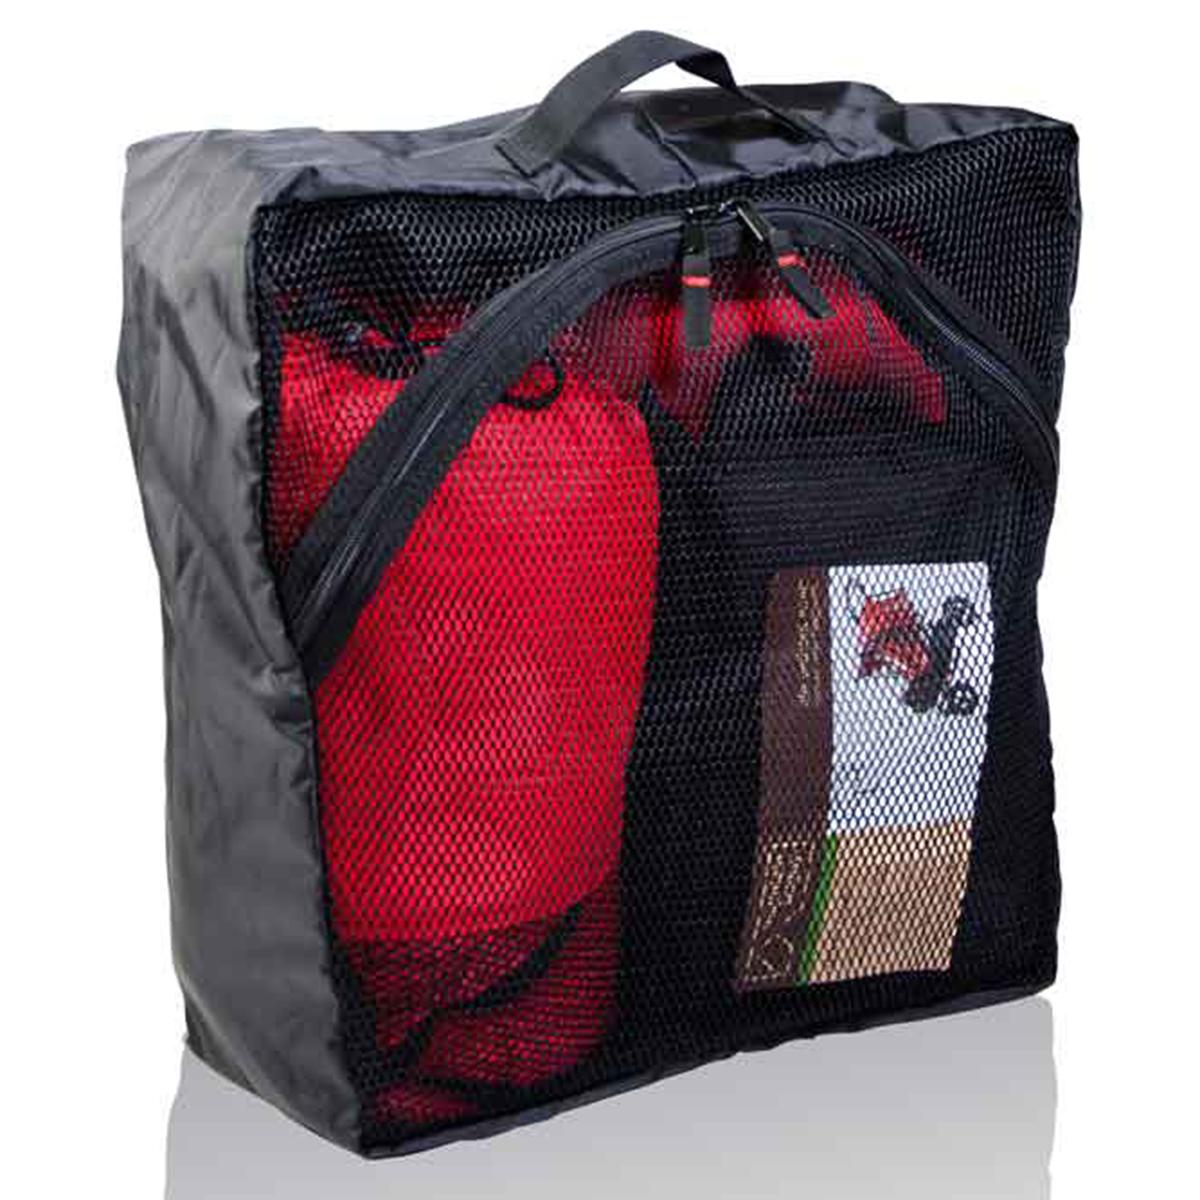 Carry-on Storage Bag BLACK-30